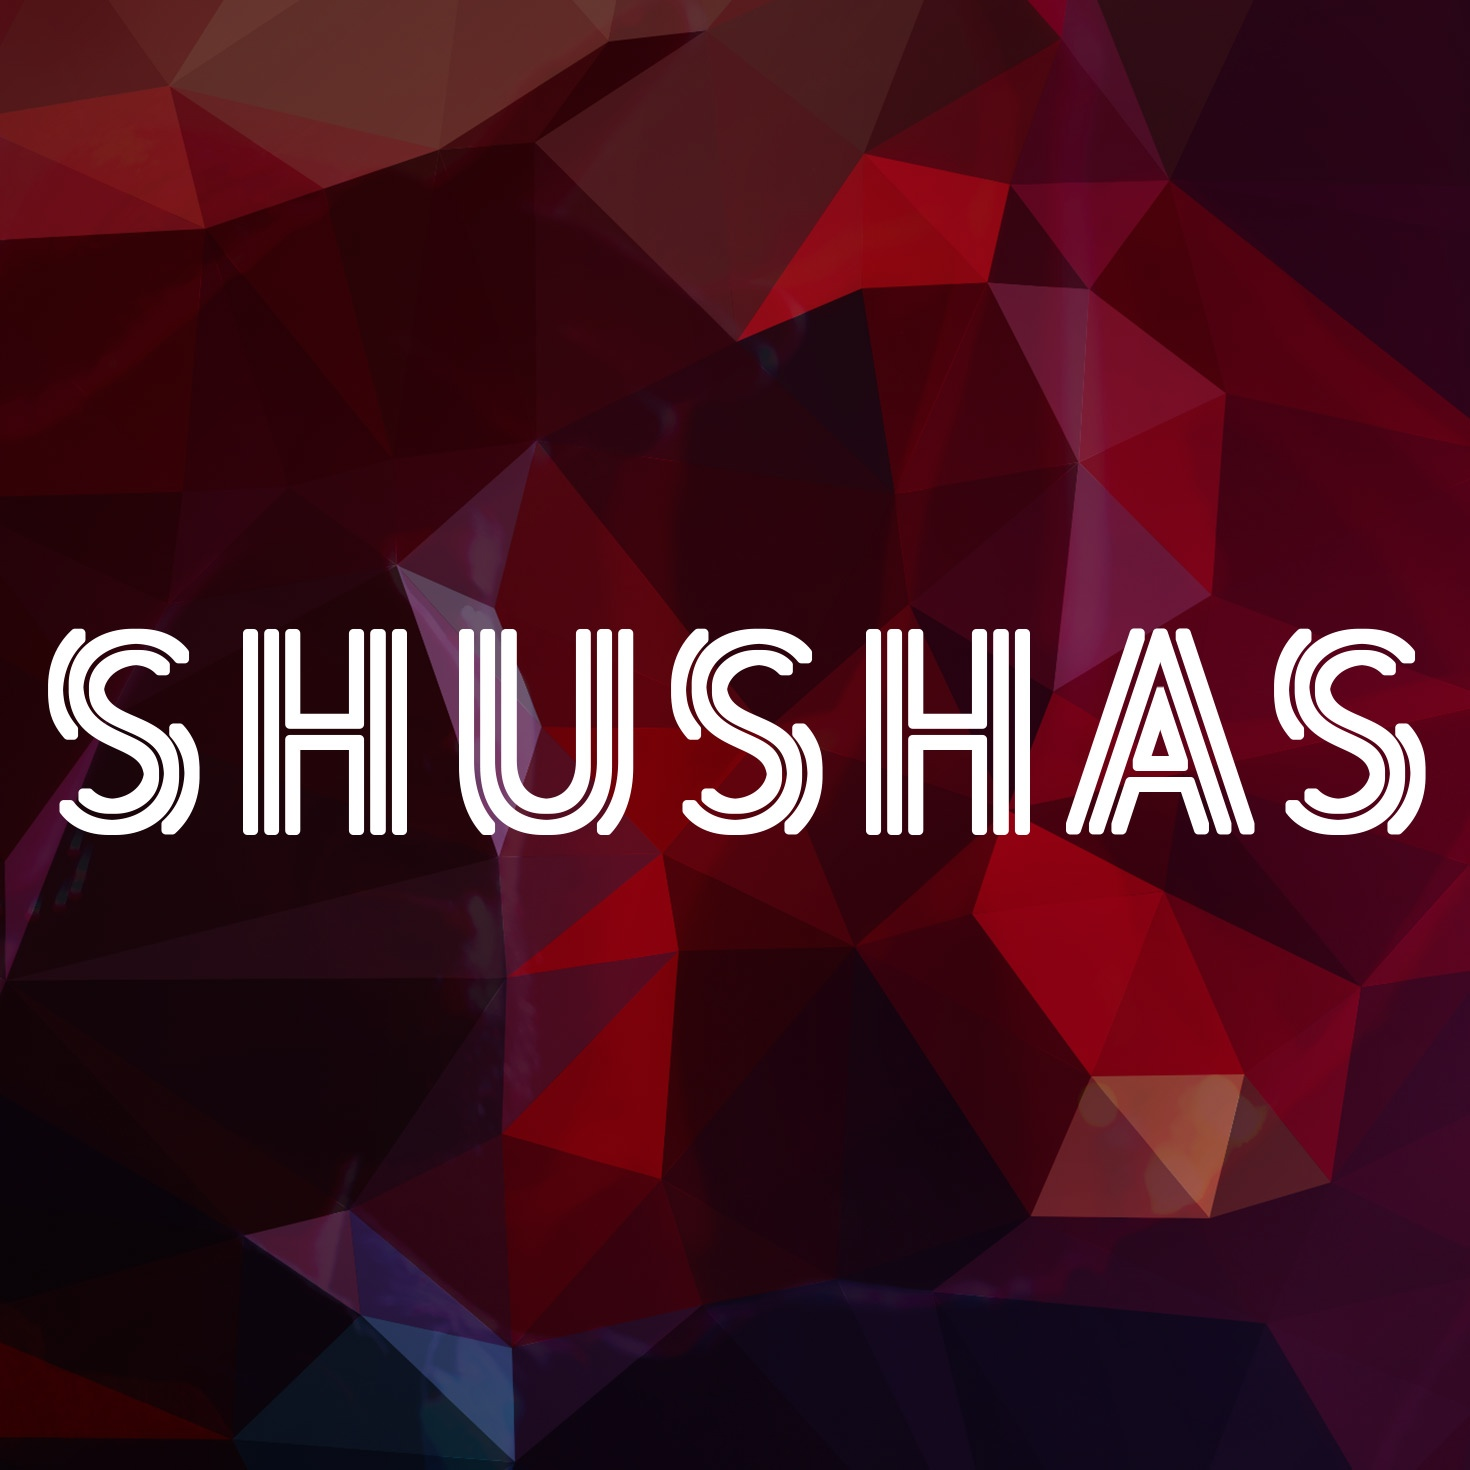 Логотип площадки Shushas (ex. Shishas Flame Bar)